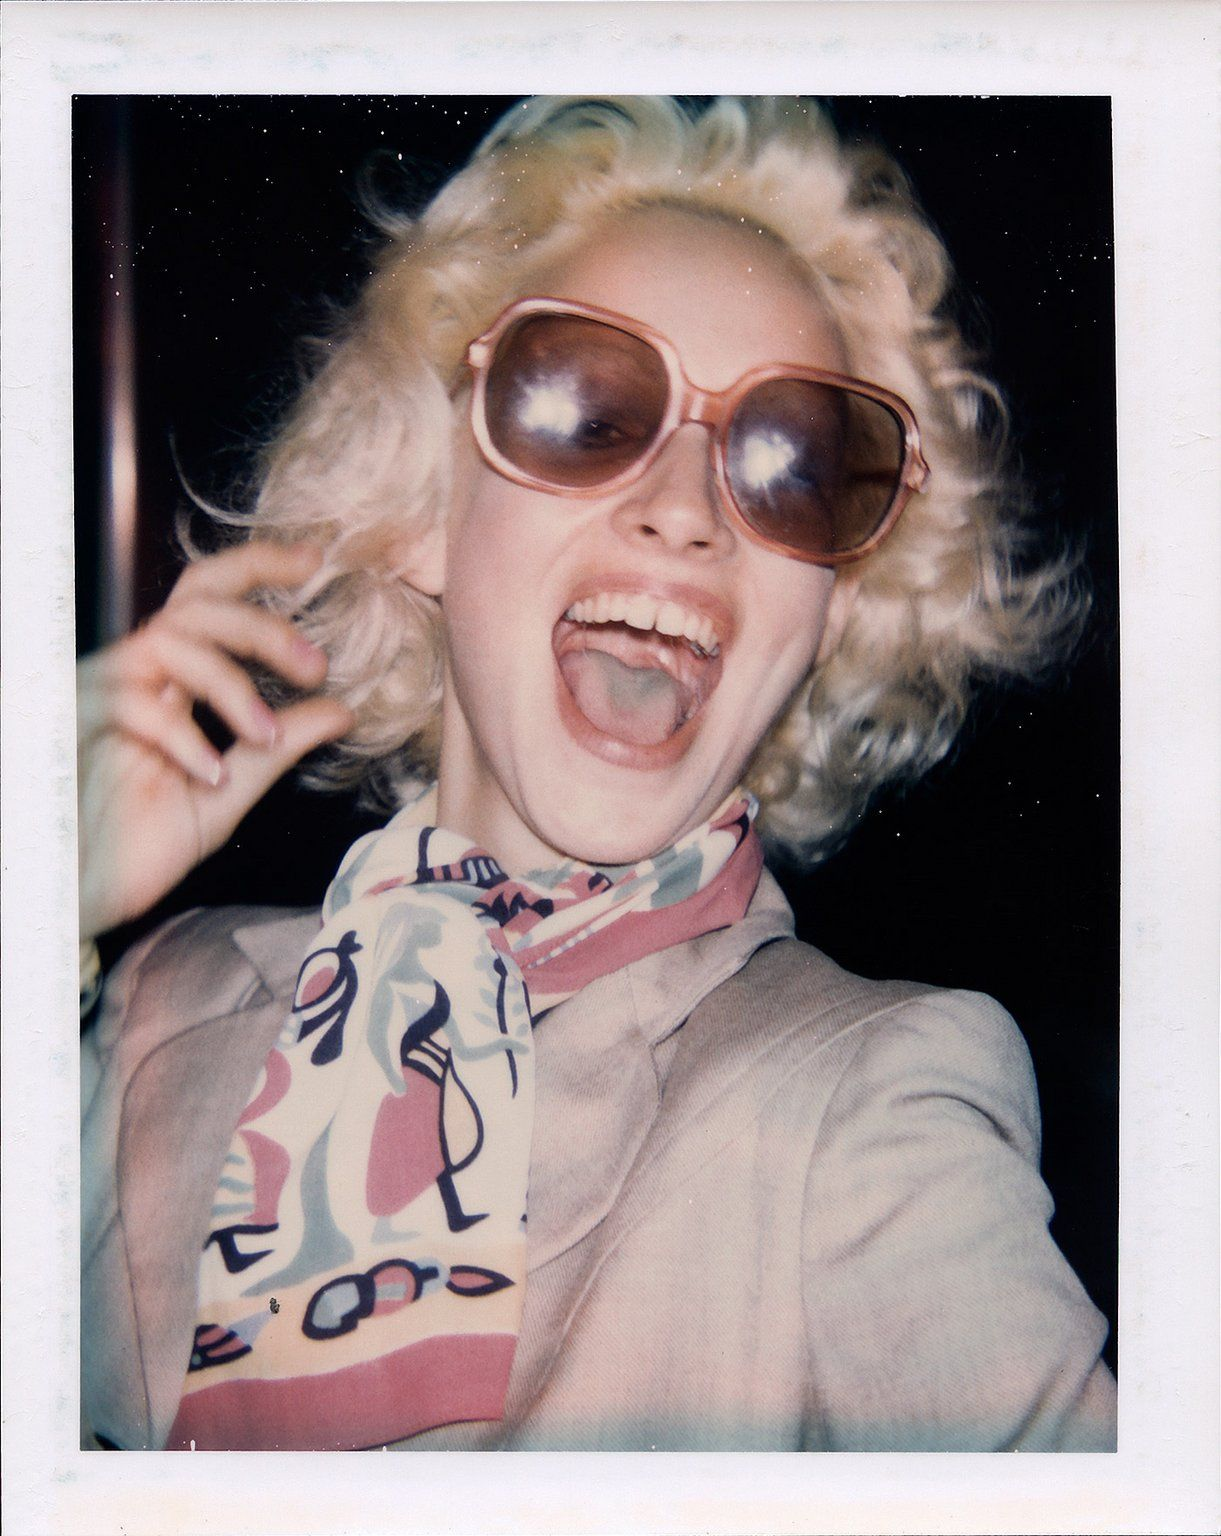 Donna Jordan, 1971 (Polaroid) ©The Andy Warhol Foundation for the Visual Arts, Inc.